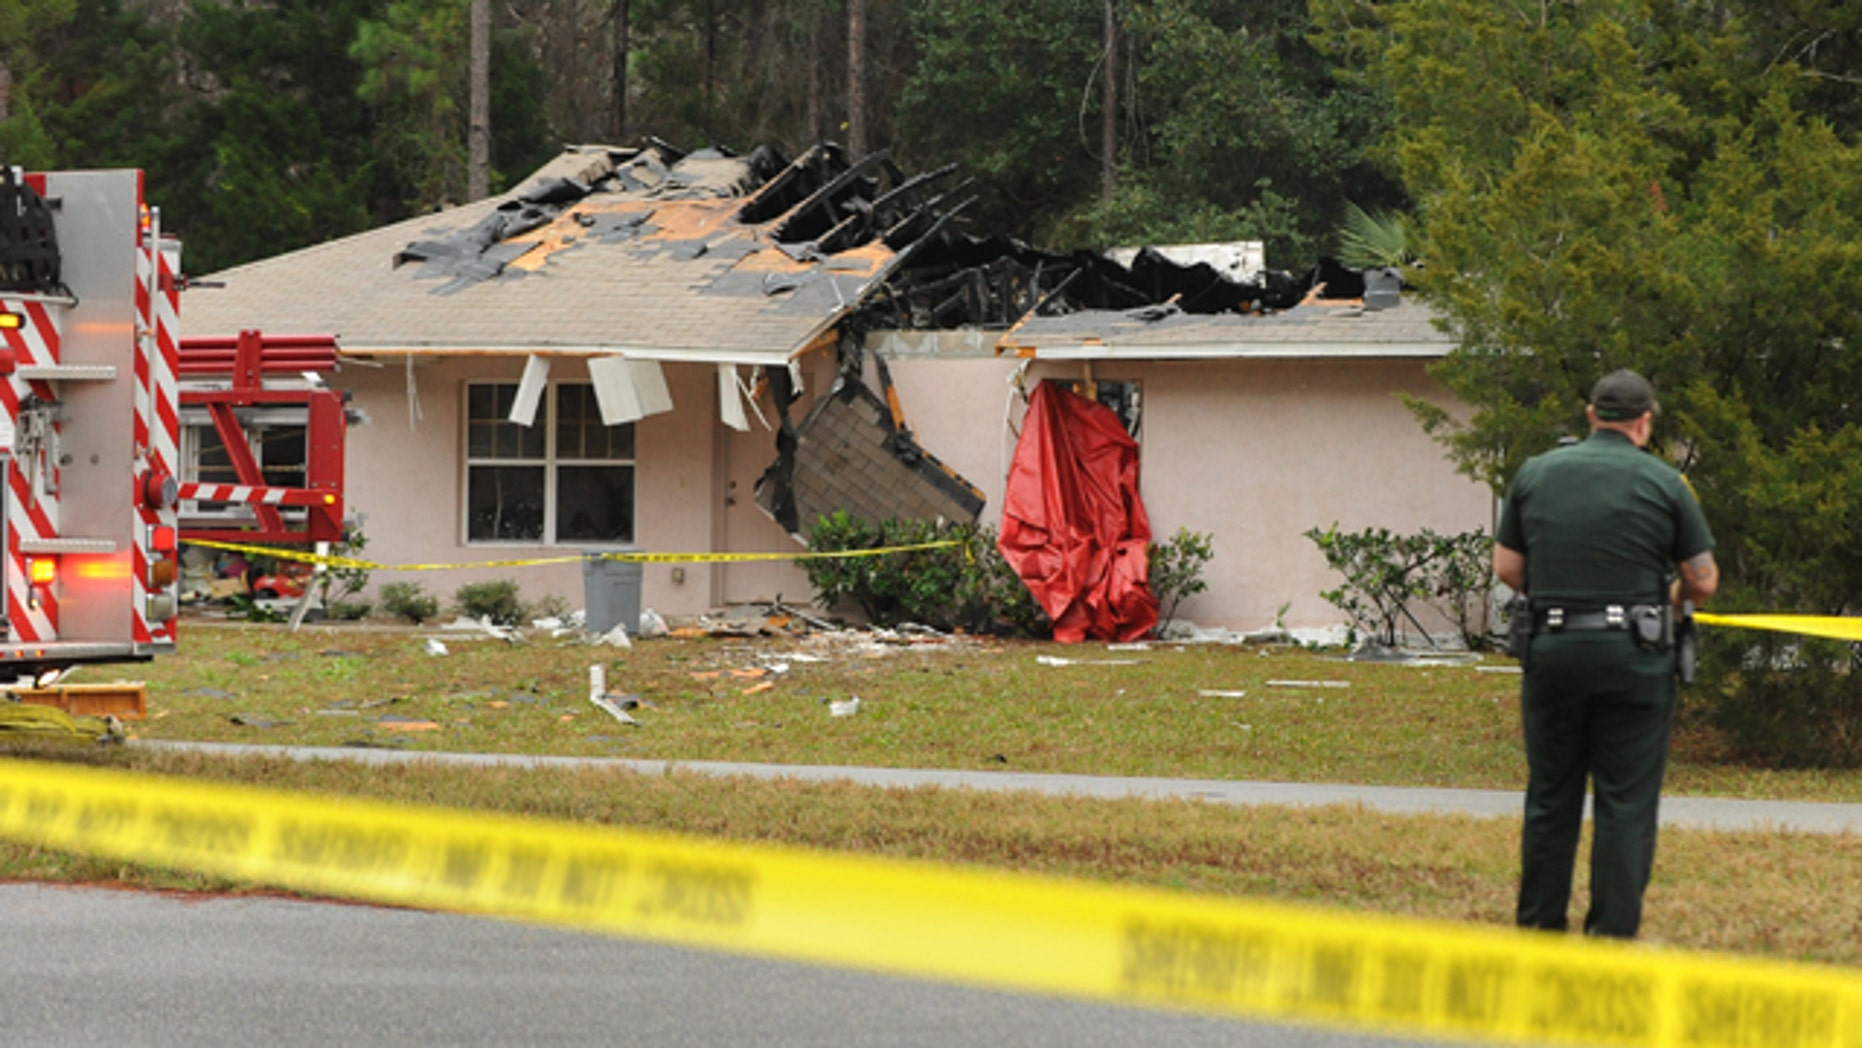 Jan. 4, 2013: Emergency personnel investigate the scene of a plane crash in Palm Coast, Fla.